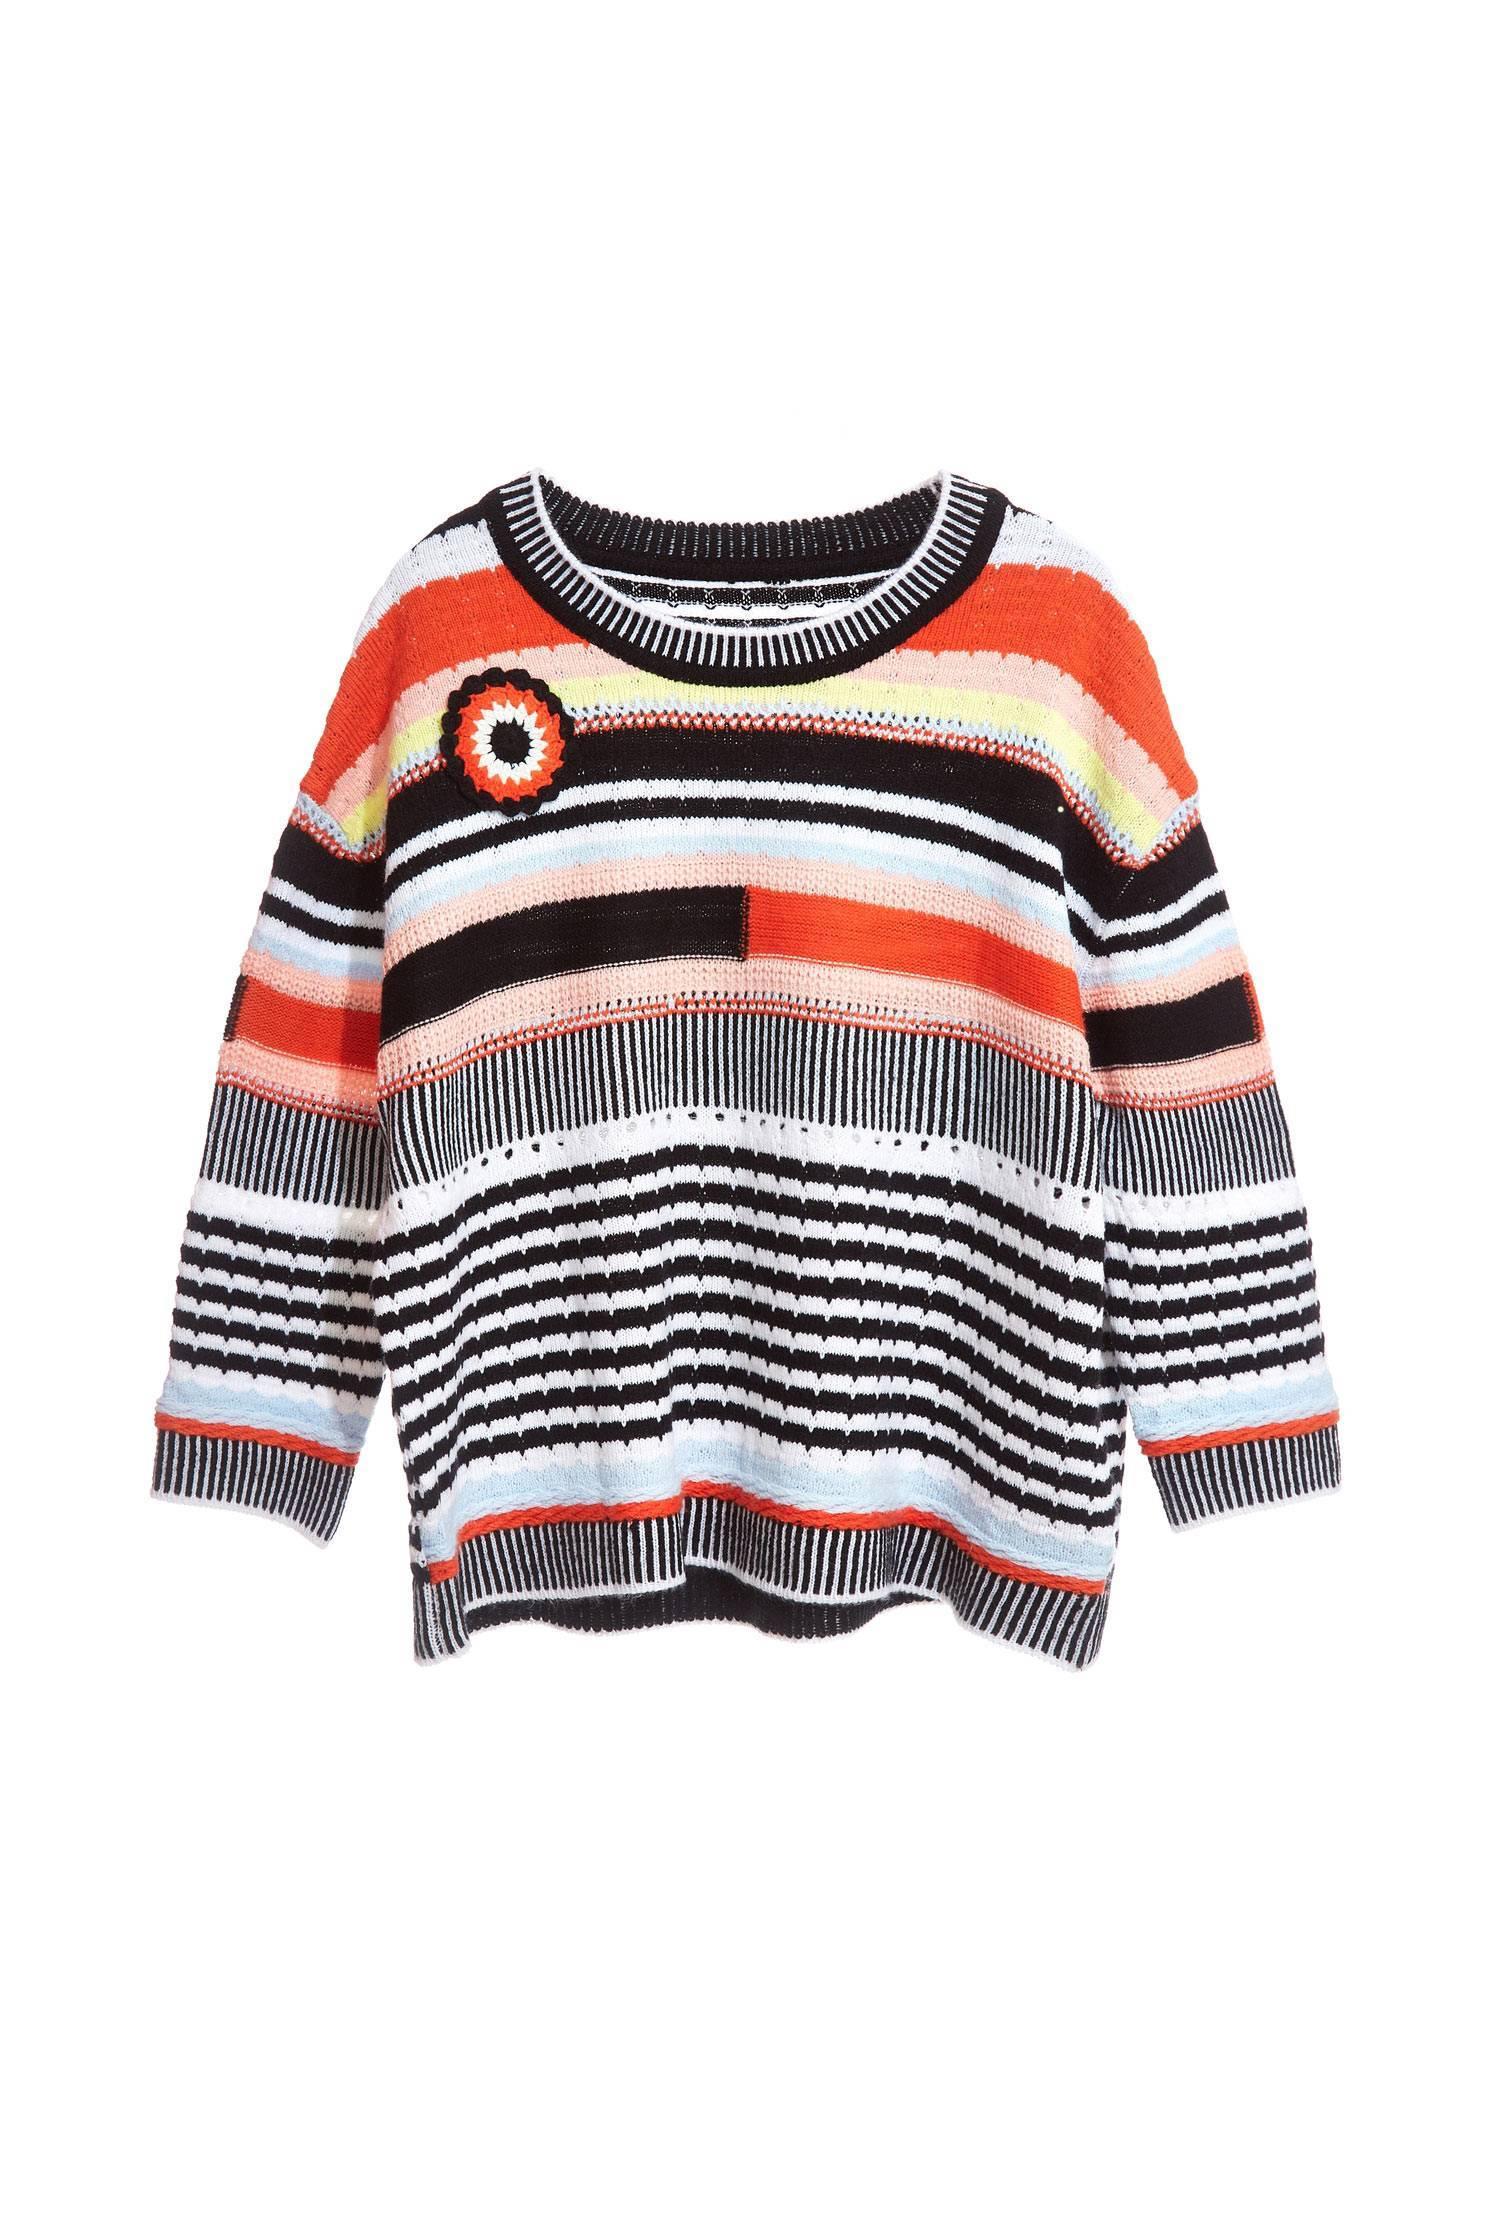 Irregular Stripe fashion tops